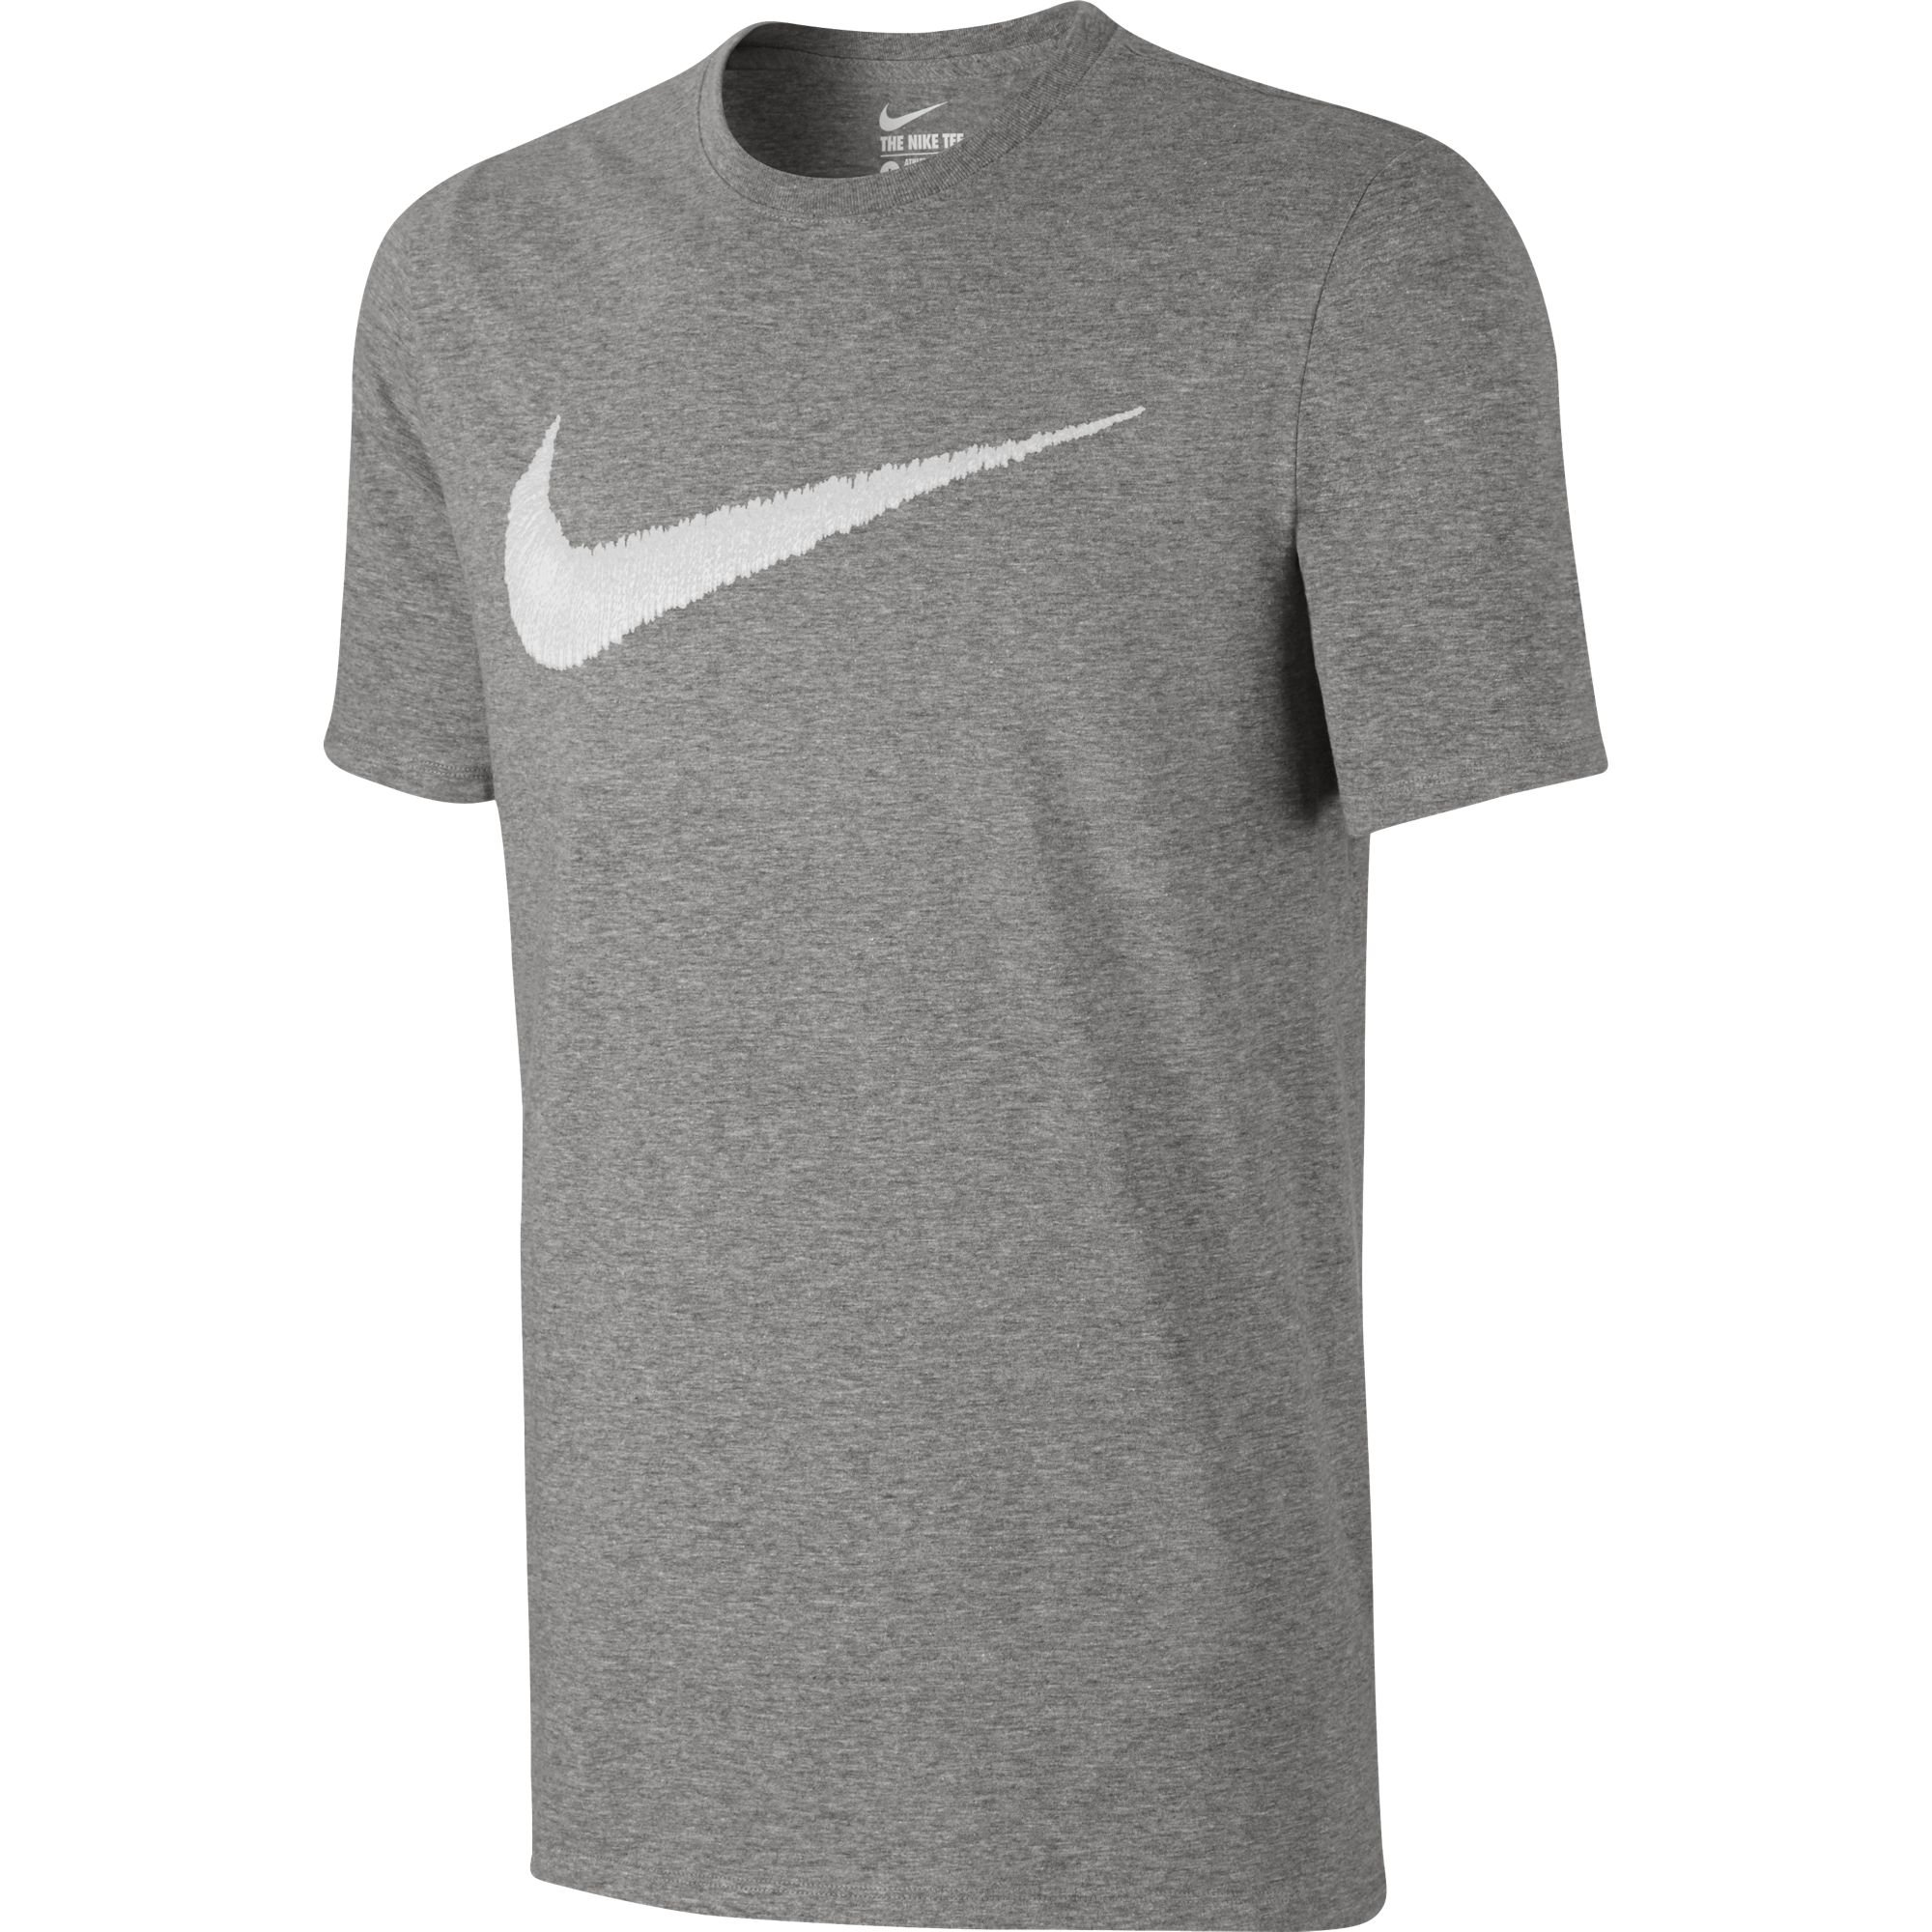 NIKE Sportswear Men's Hangtag Swoosh Tee, Dark Grey Heather/White, Small